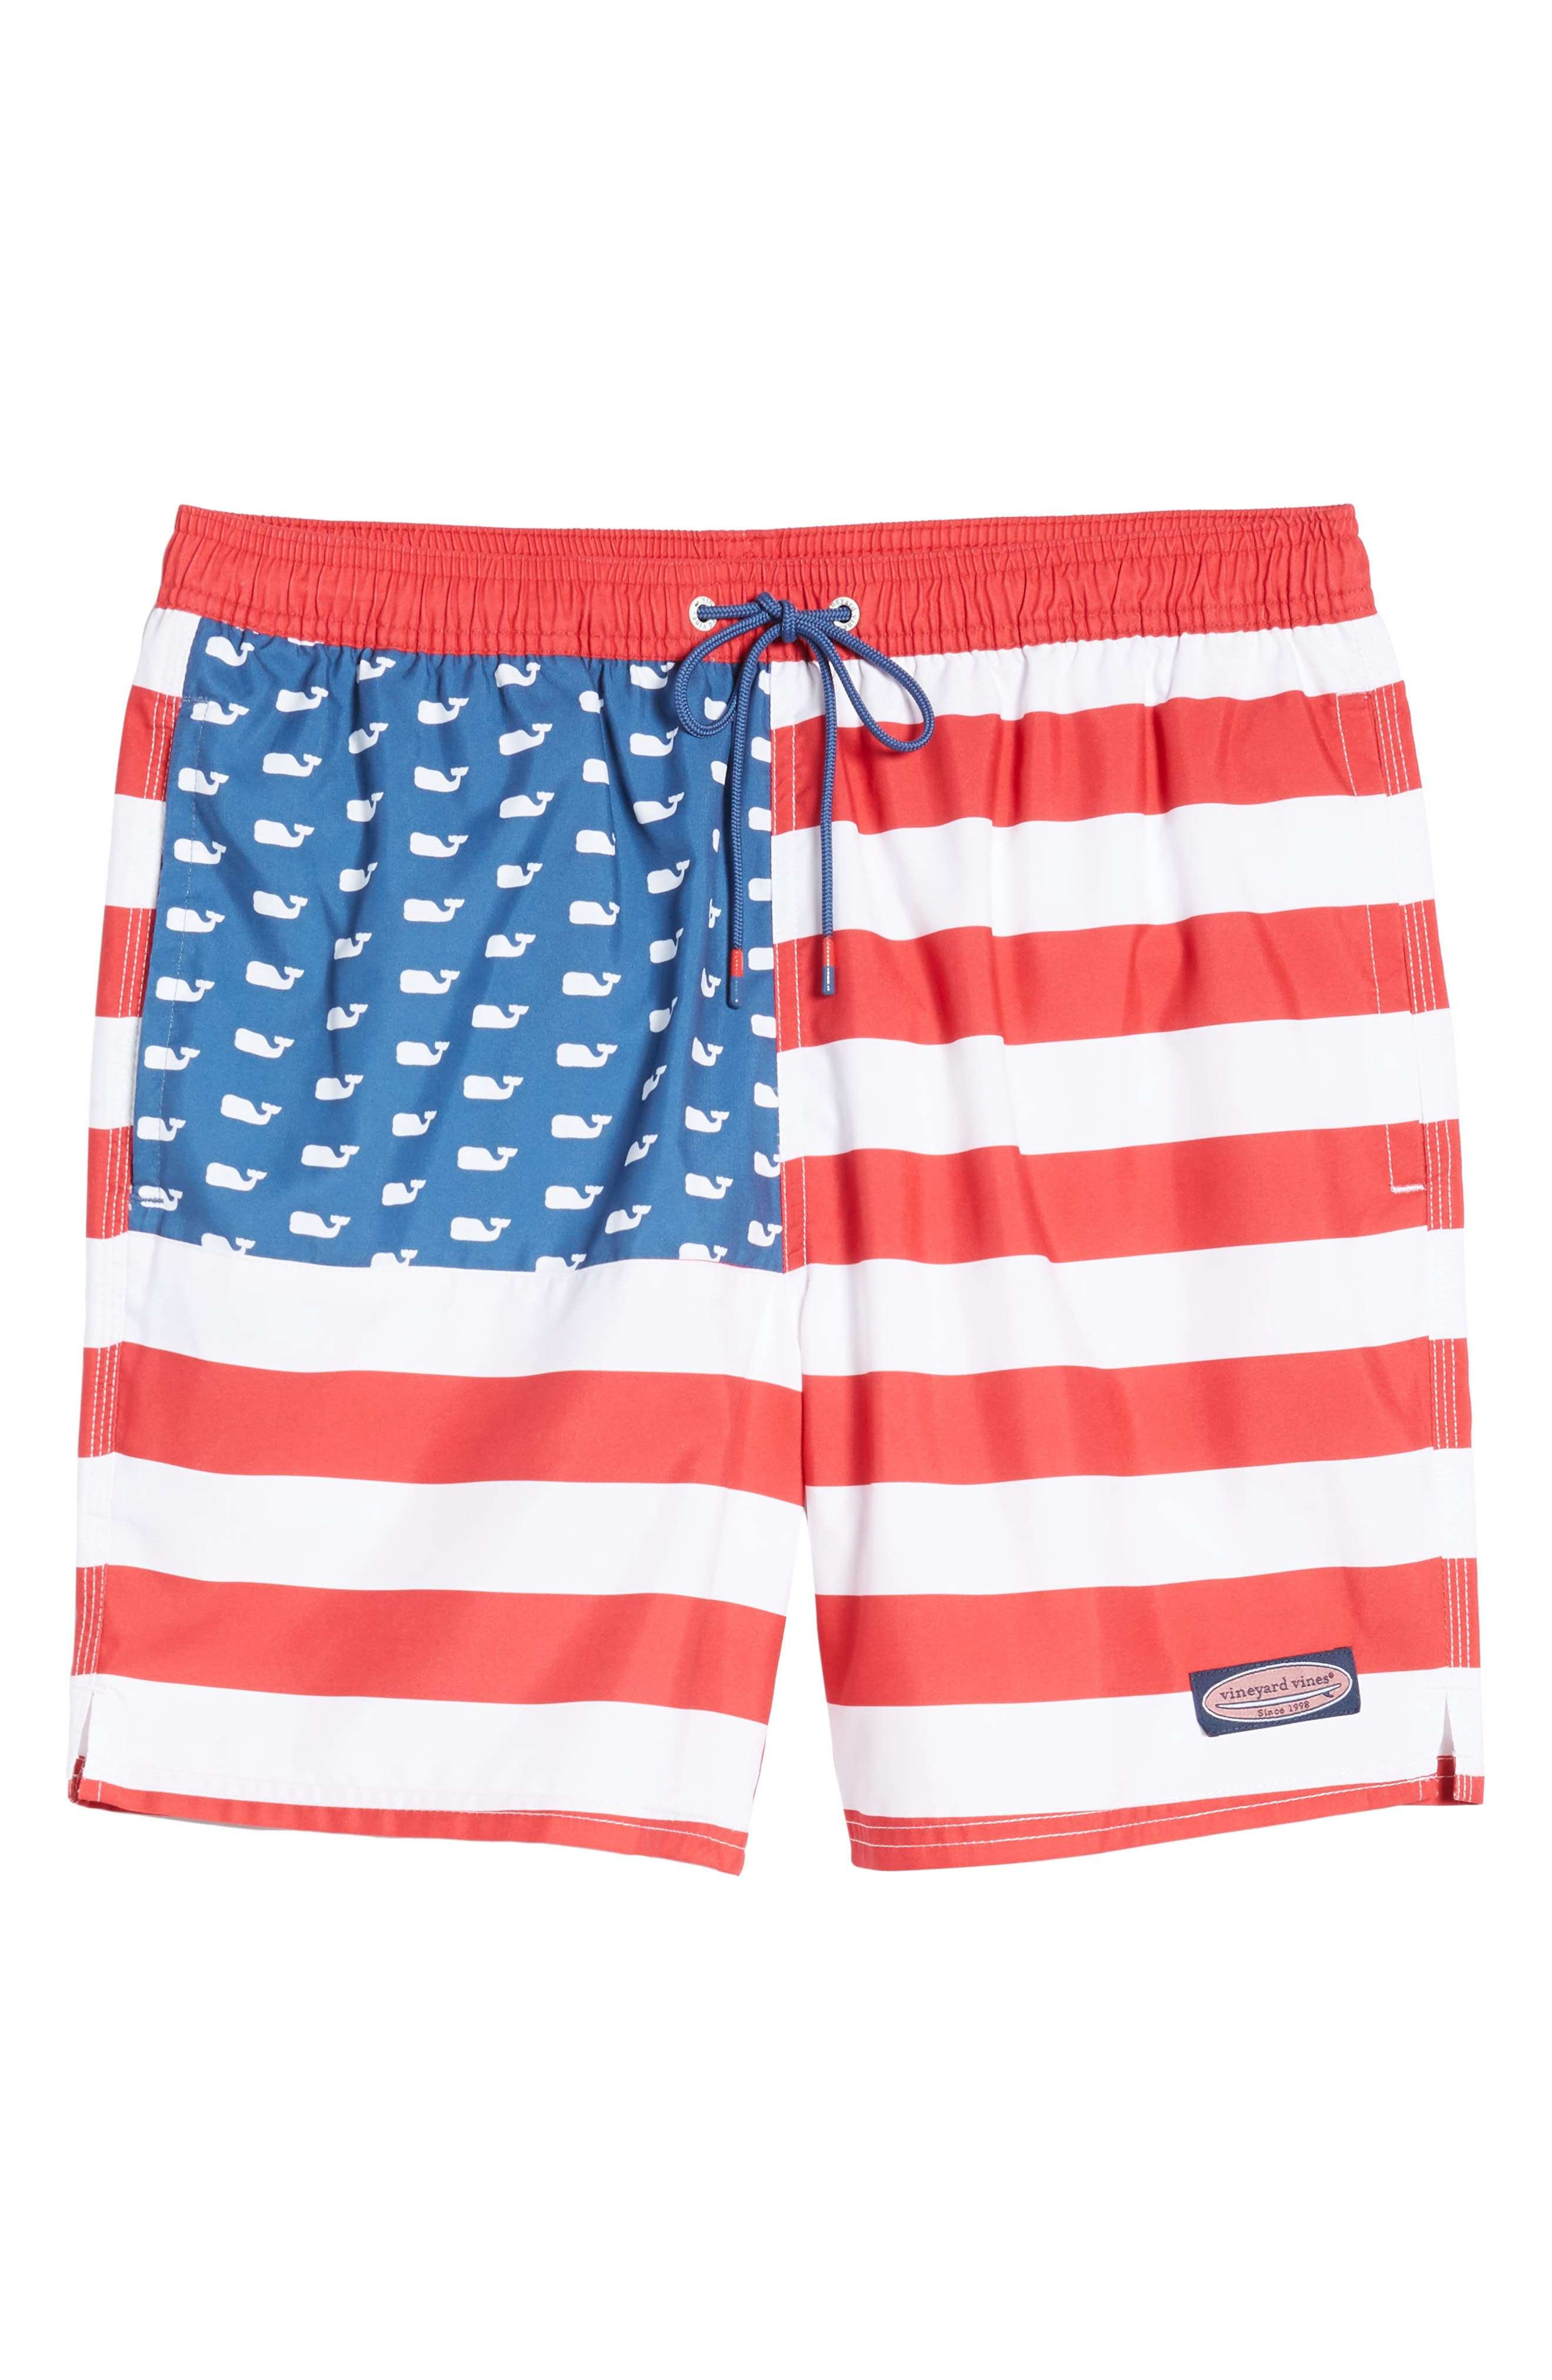 Chappy USA Flag Swim Trunks,                             Alternate thumbnail 6, color,                             461